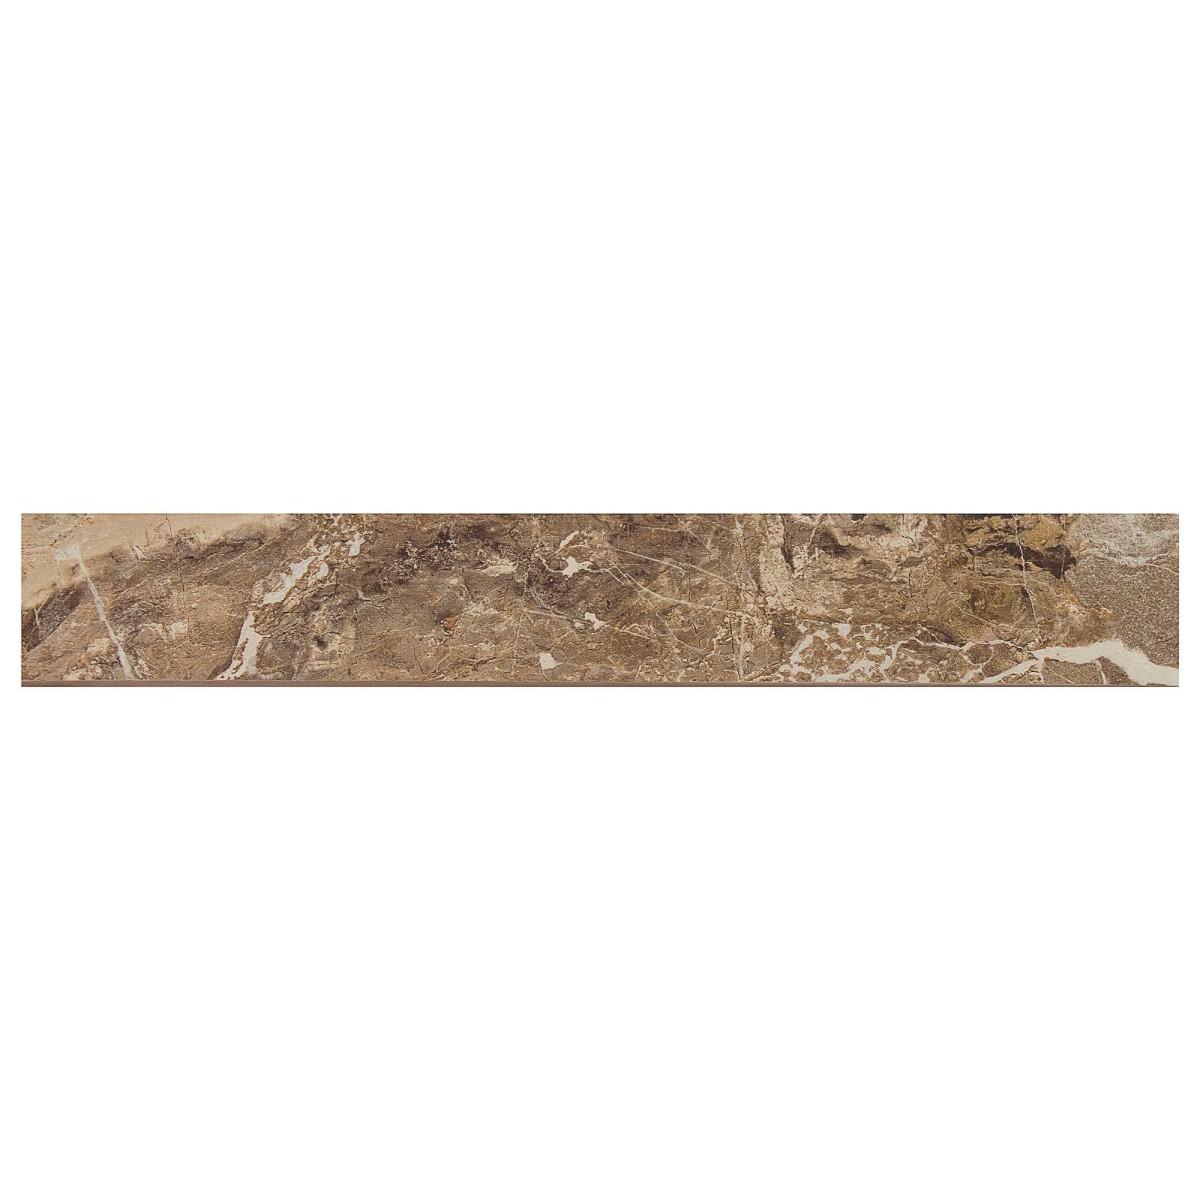 Плинтус Rod Privilege Moka mate 7.2x45 см цвет коричневый